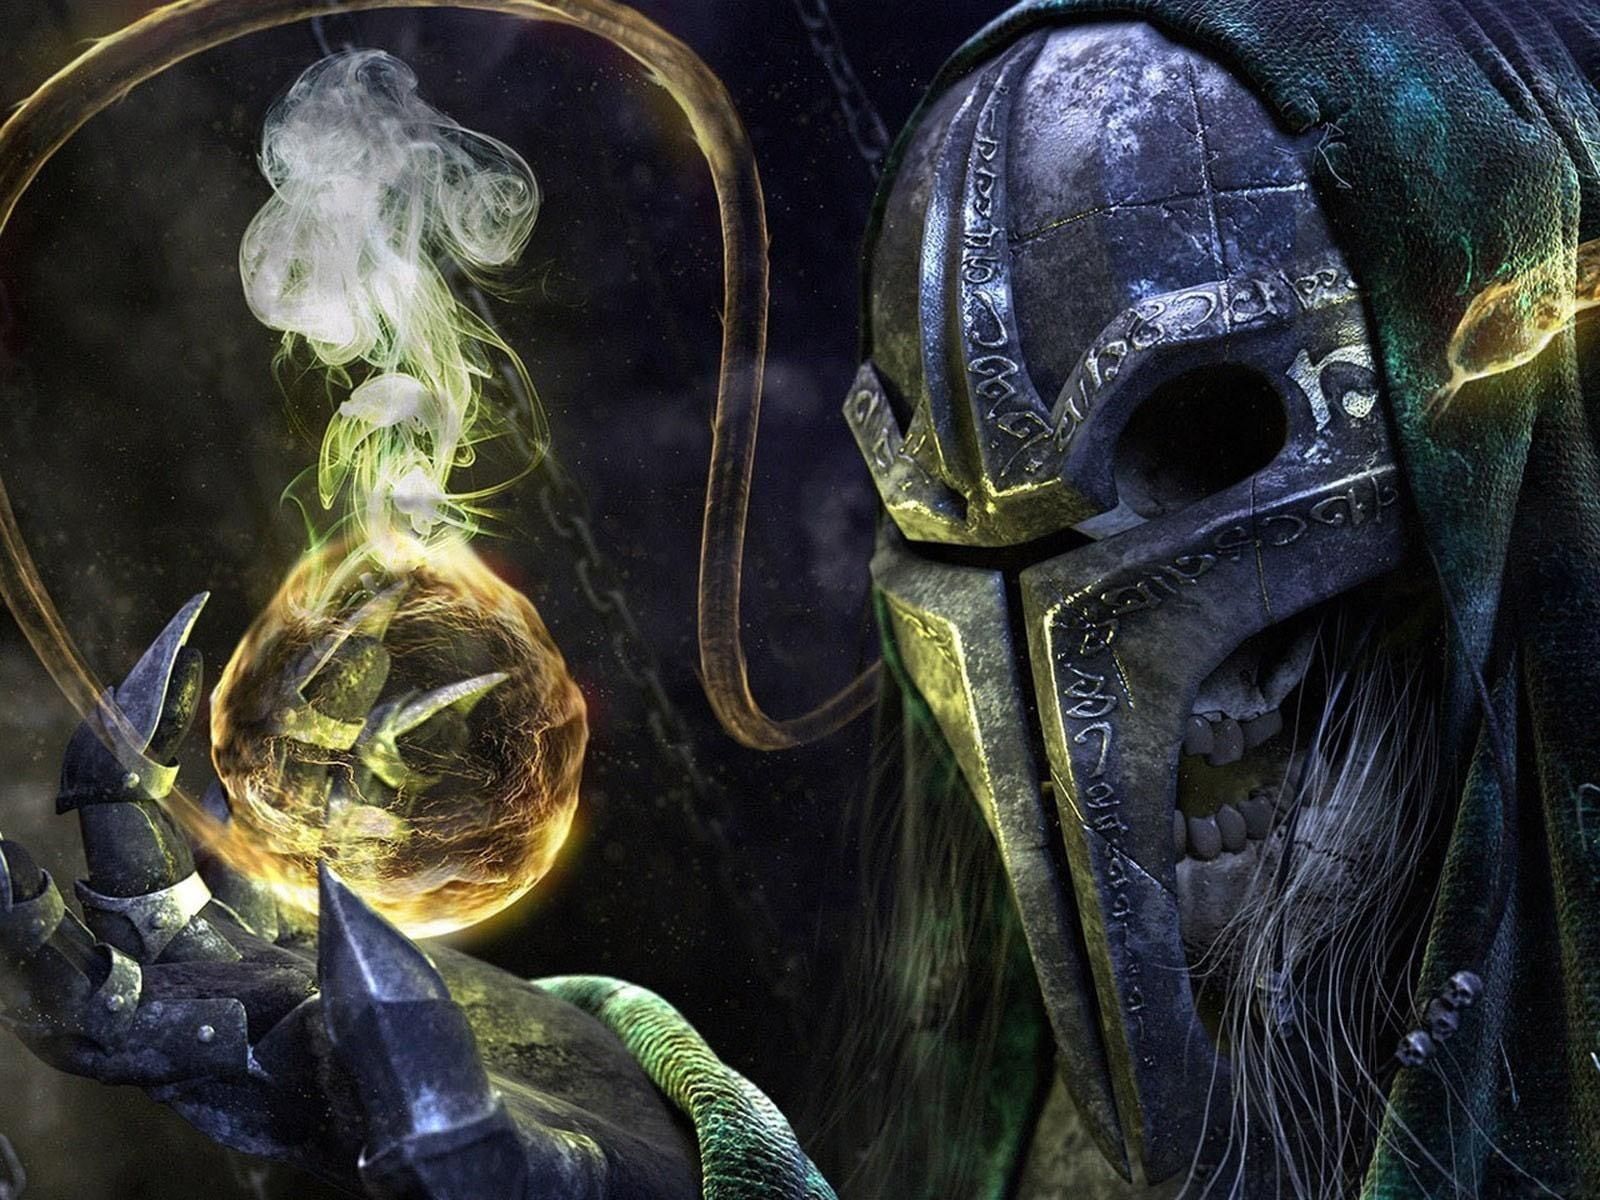 Video game character digital wallpaper evil 3D CGI skeleton HD 1600x1200